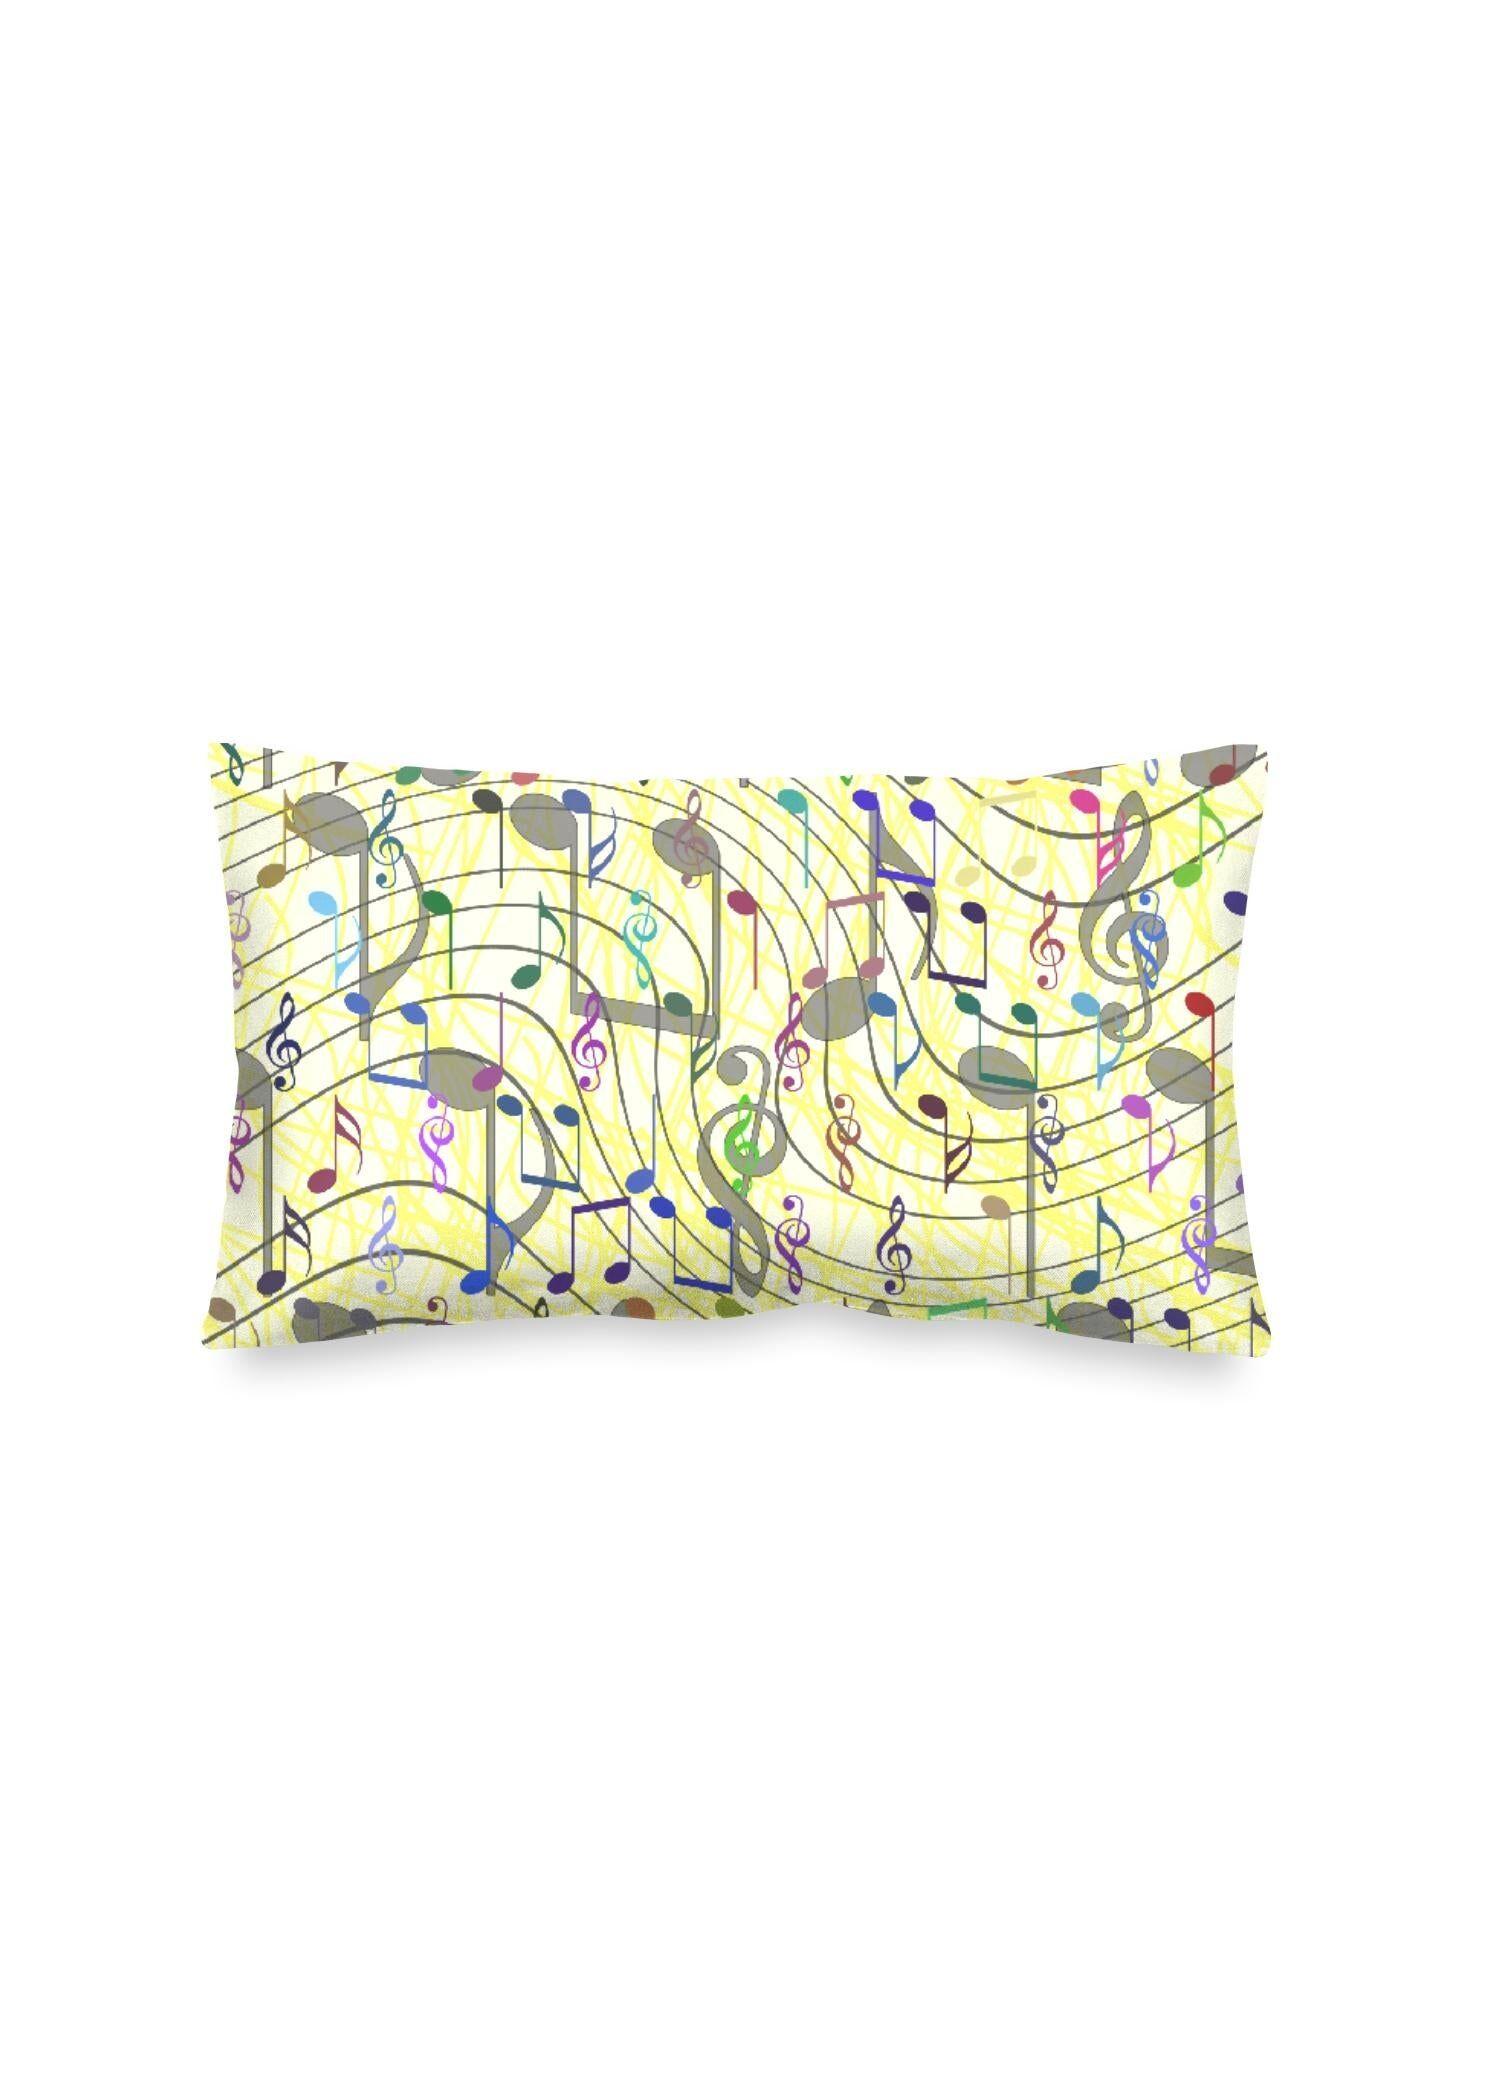 VIDA Oblong Pillow - Chaotic Music Notation by VIDA Original Artist  - Size: Luster